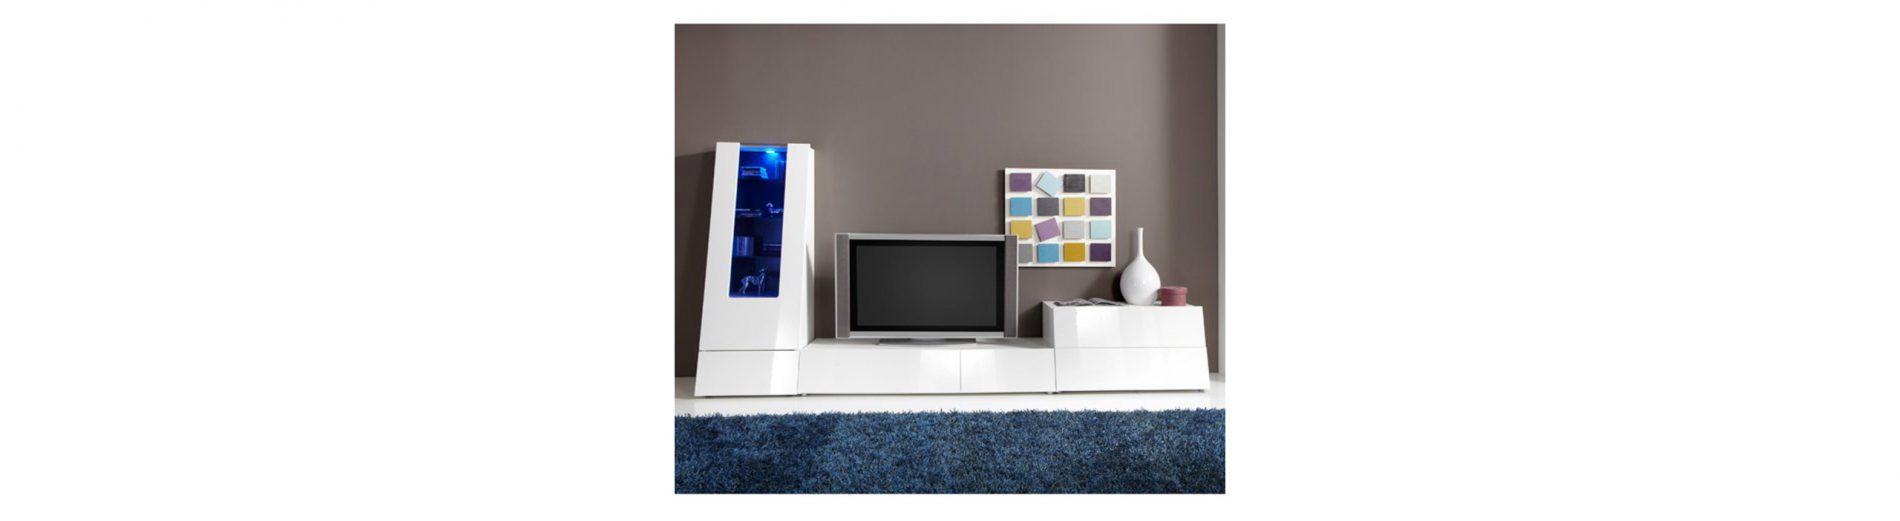 Make Your Living Room Unique with Creative Interior Design Ideas